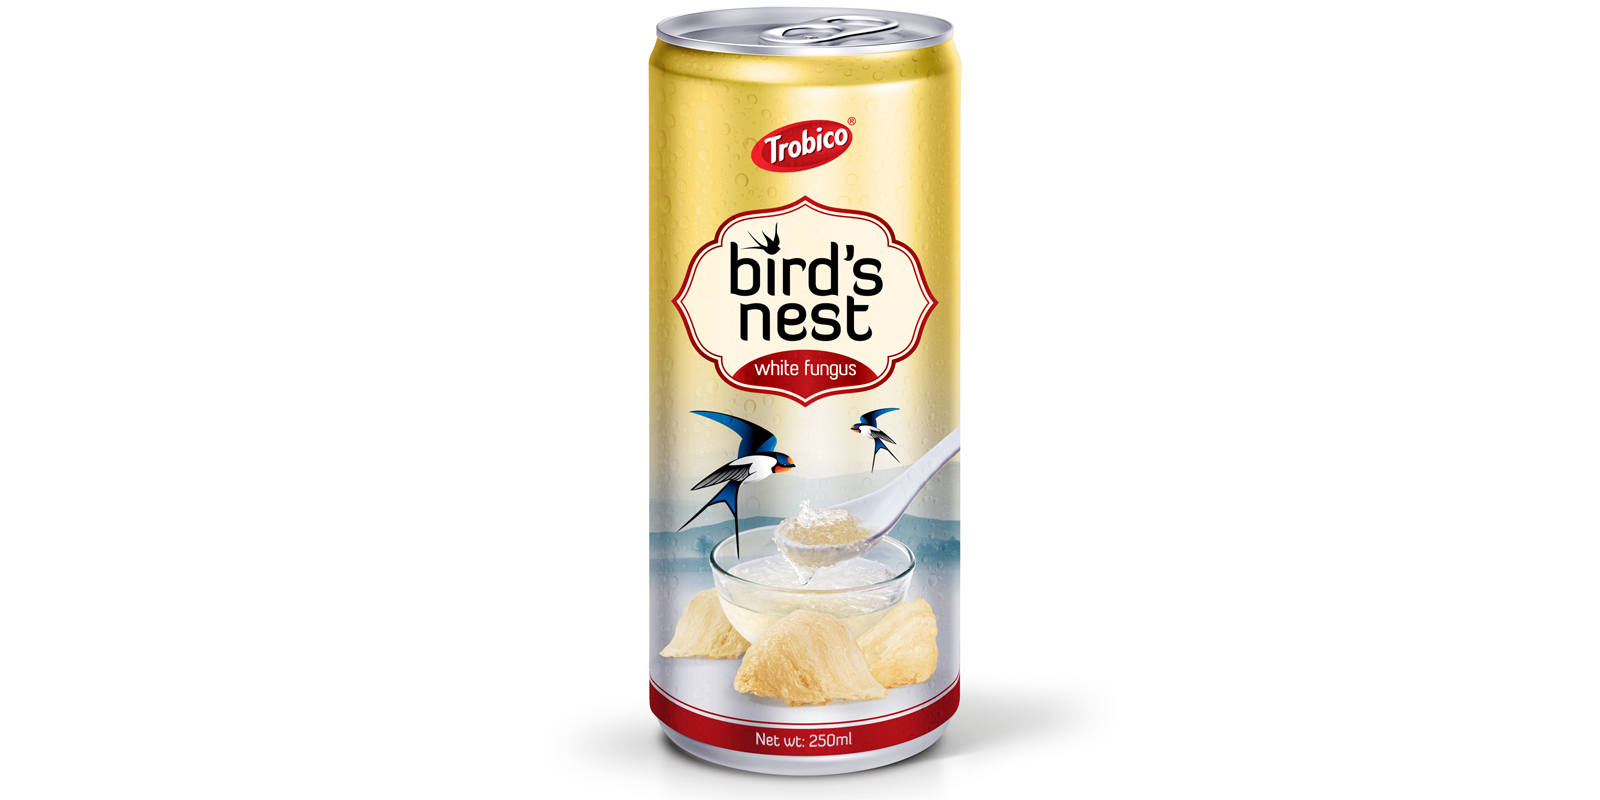 Healthy drinksBirds Nest Trobico